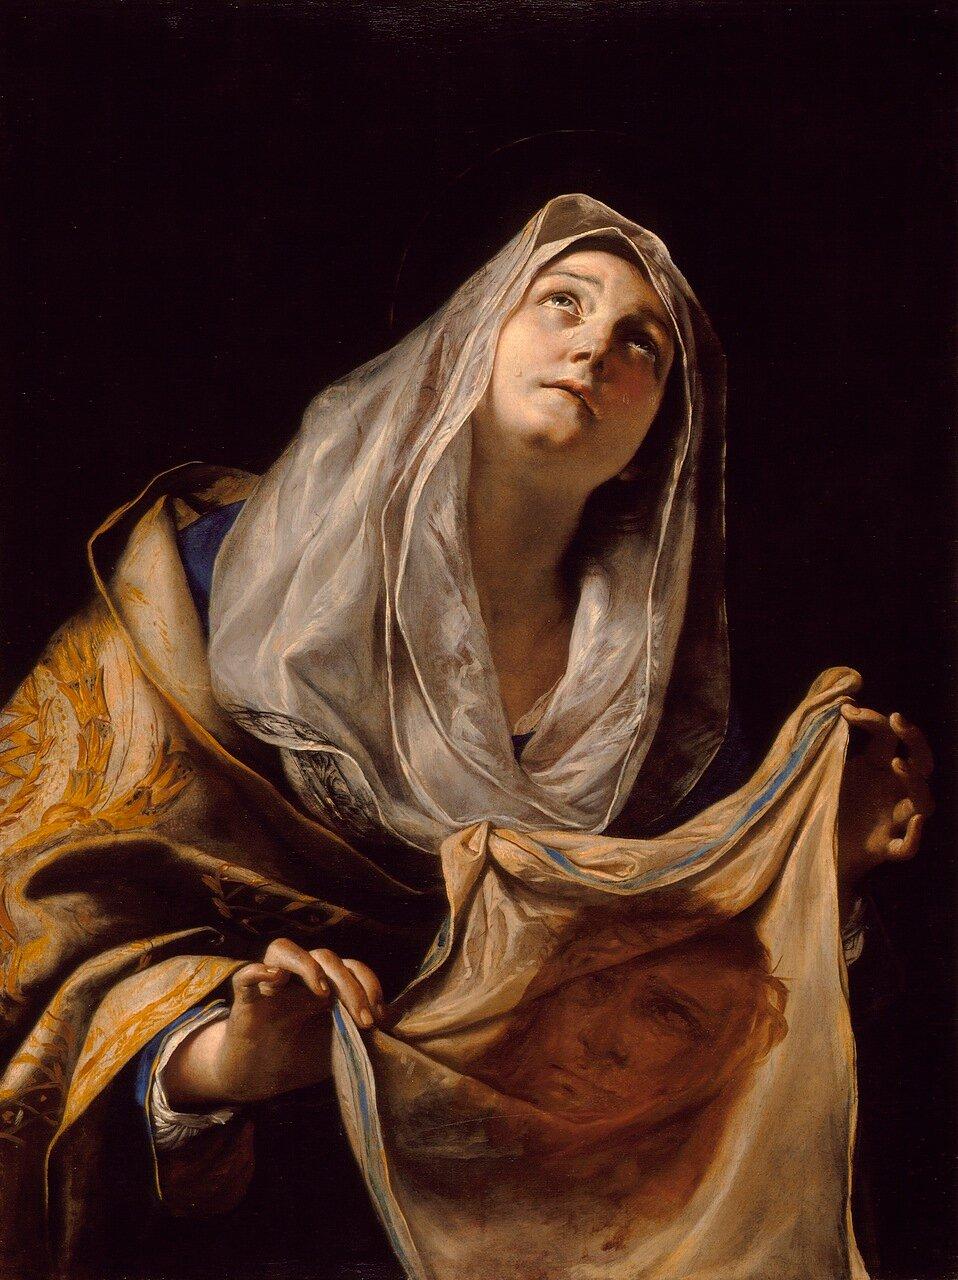 икона святой вероники: